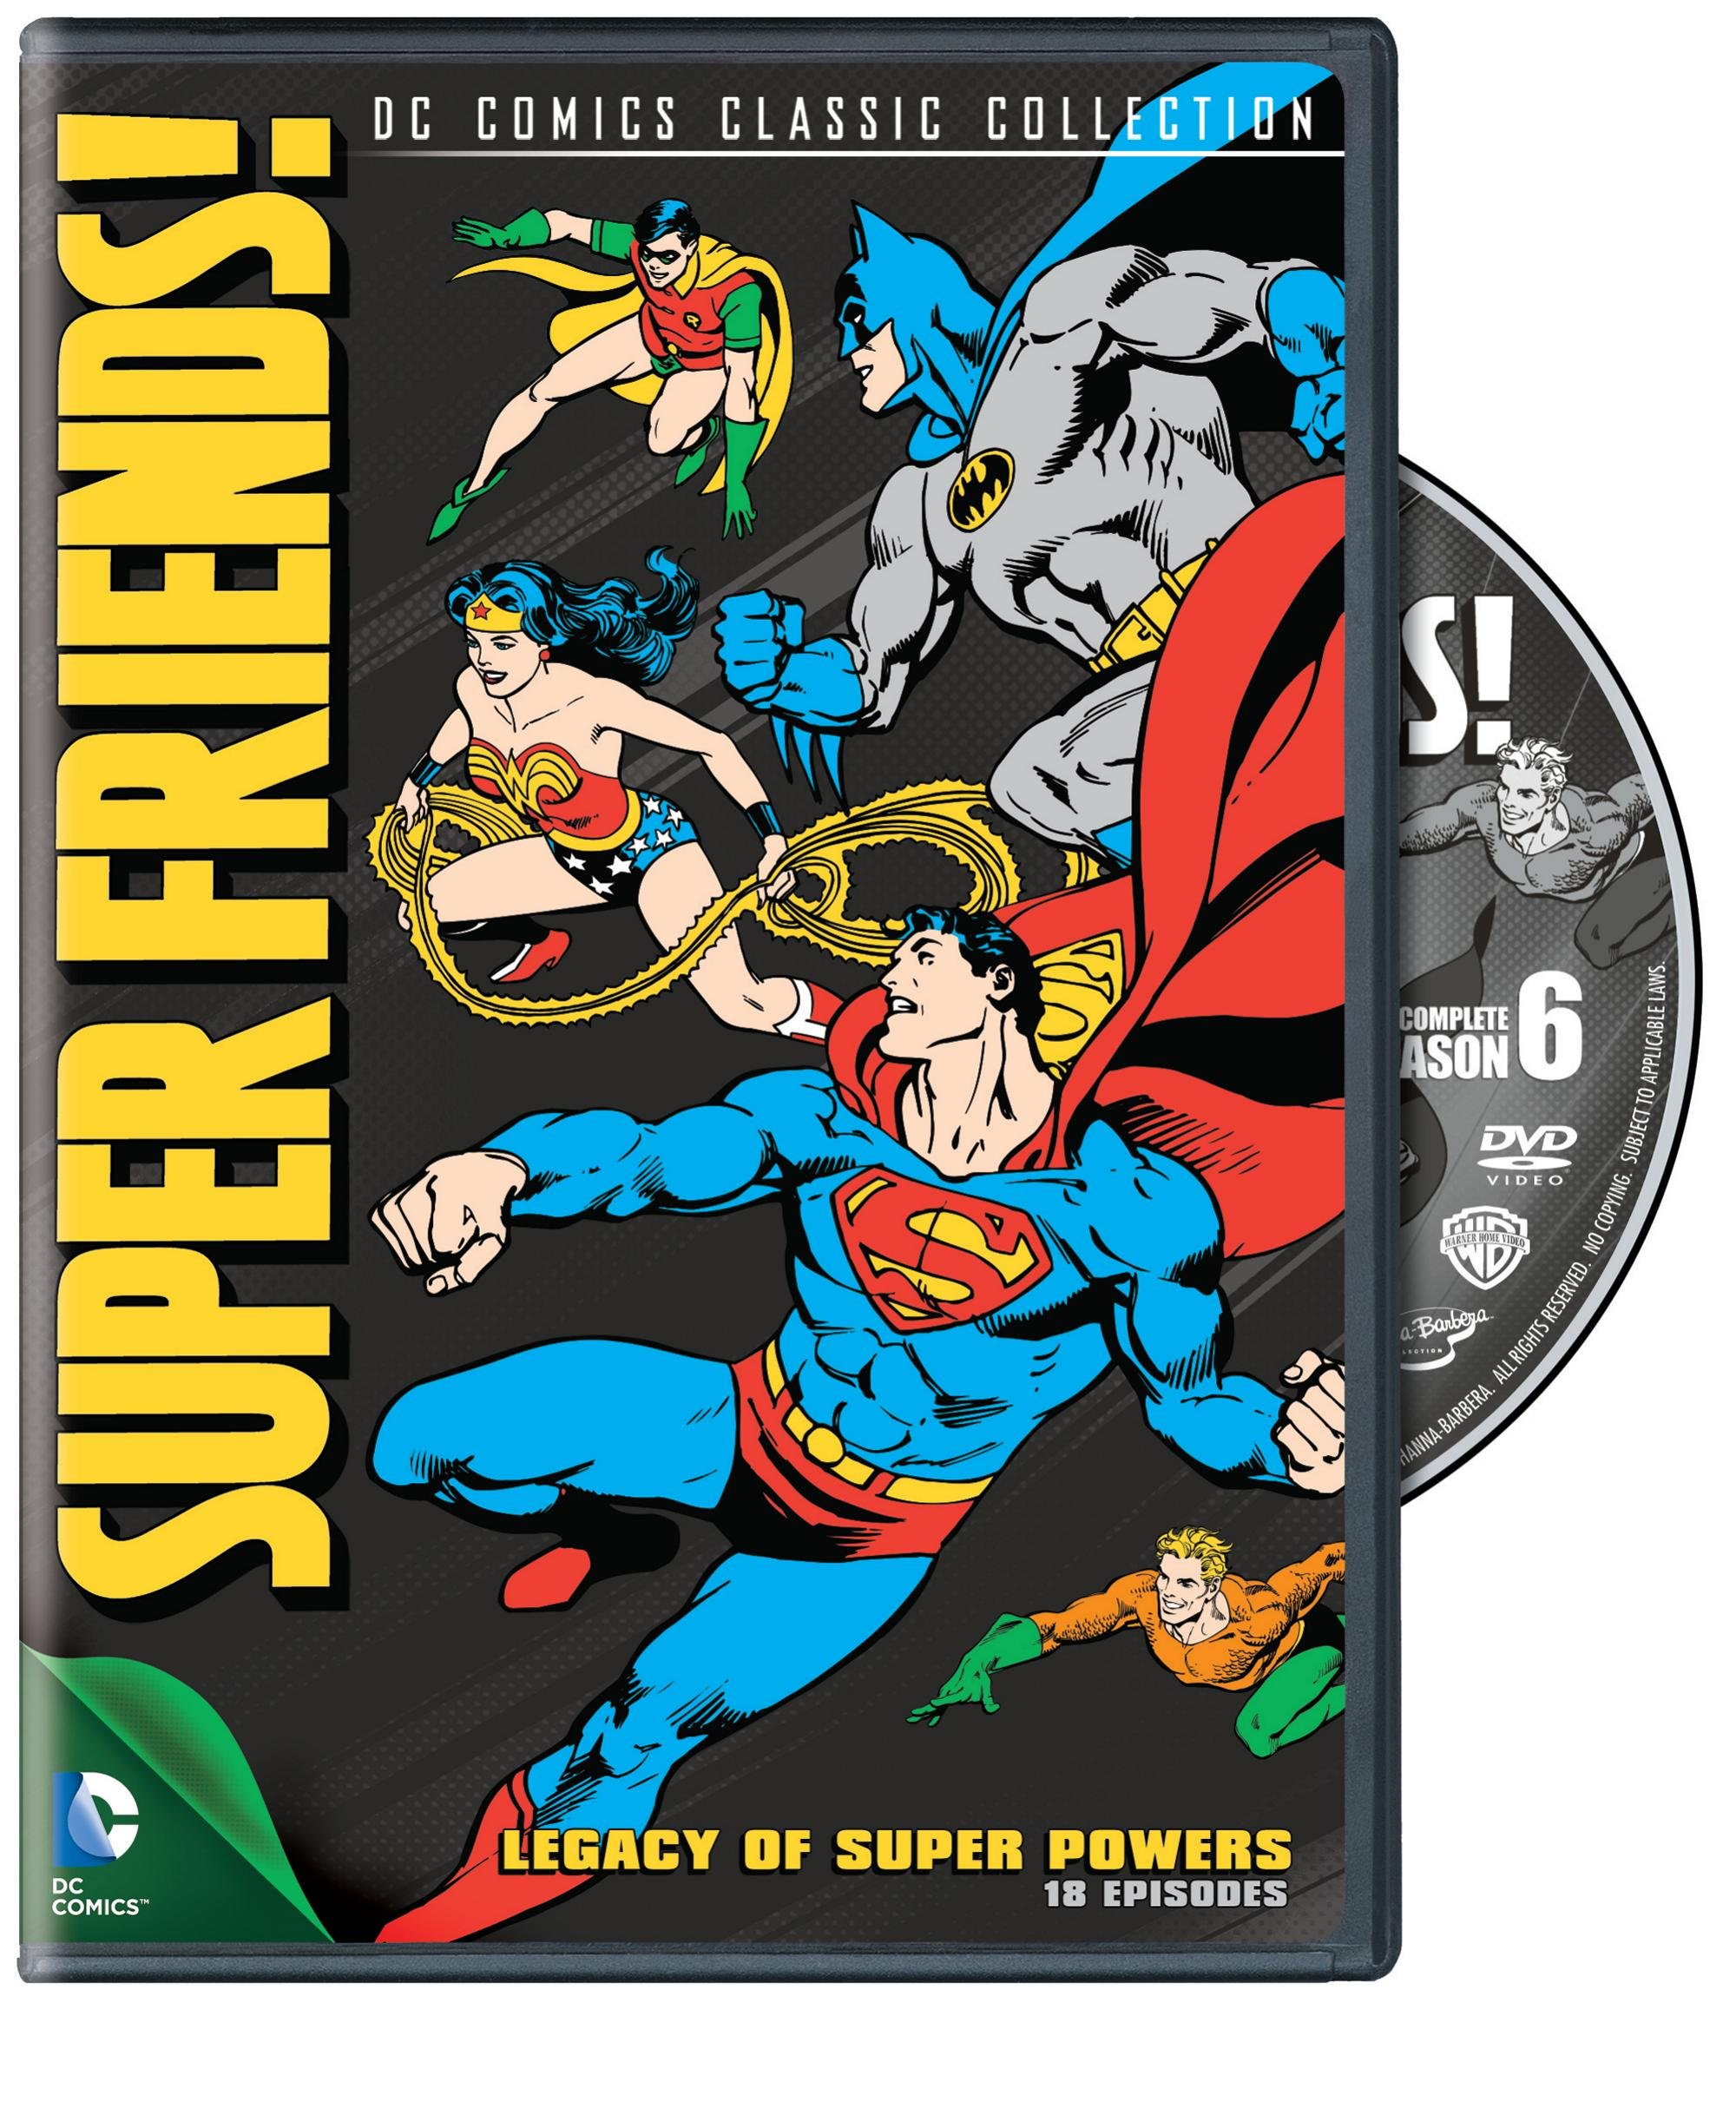 DVD : Super Friends: Legacy of Super Powers - Season 6 (Full Frame, Digipack Packaging)